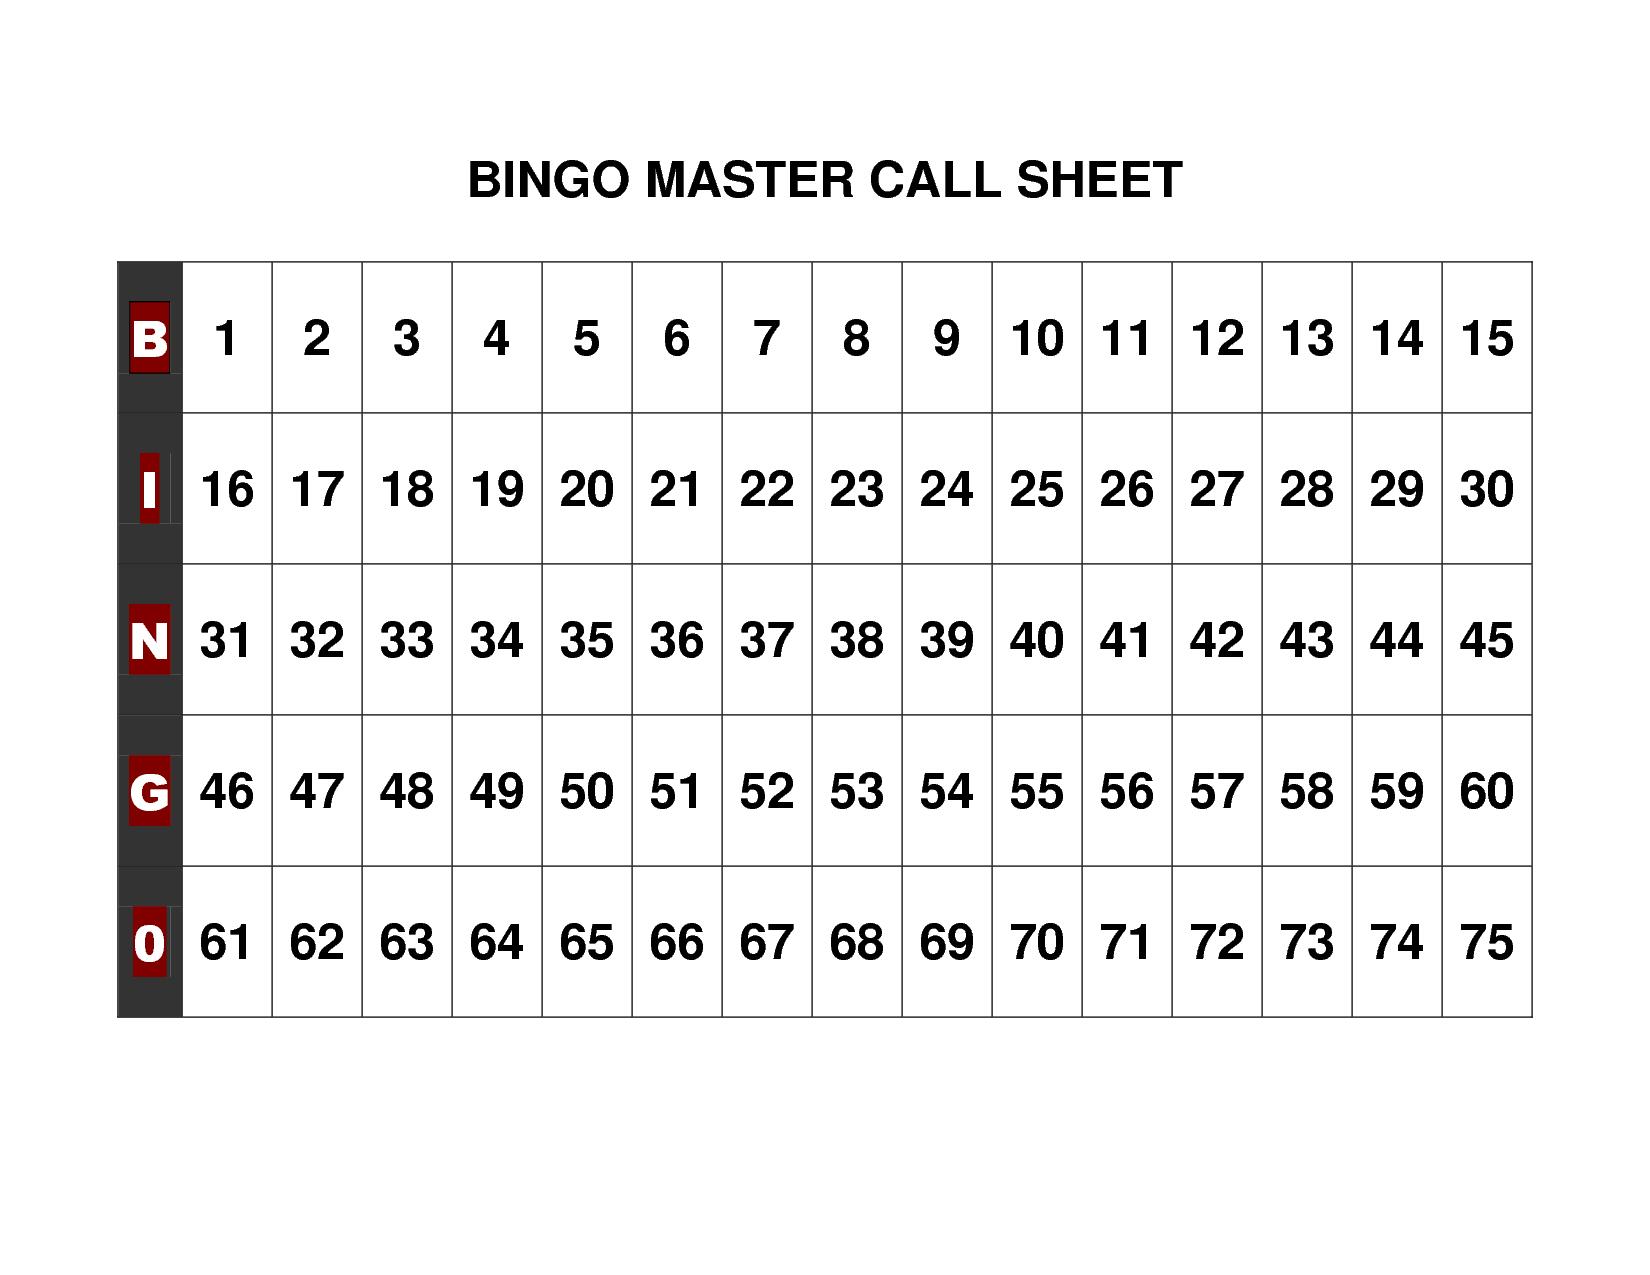 Free+Printable+Bingo+Call+Sheet | Bingo | Pinterest | Bingo, Bingo - Free Printable Bingo Cards And Call Sheet